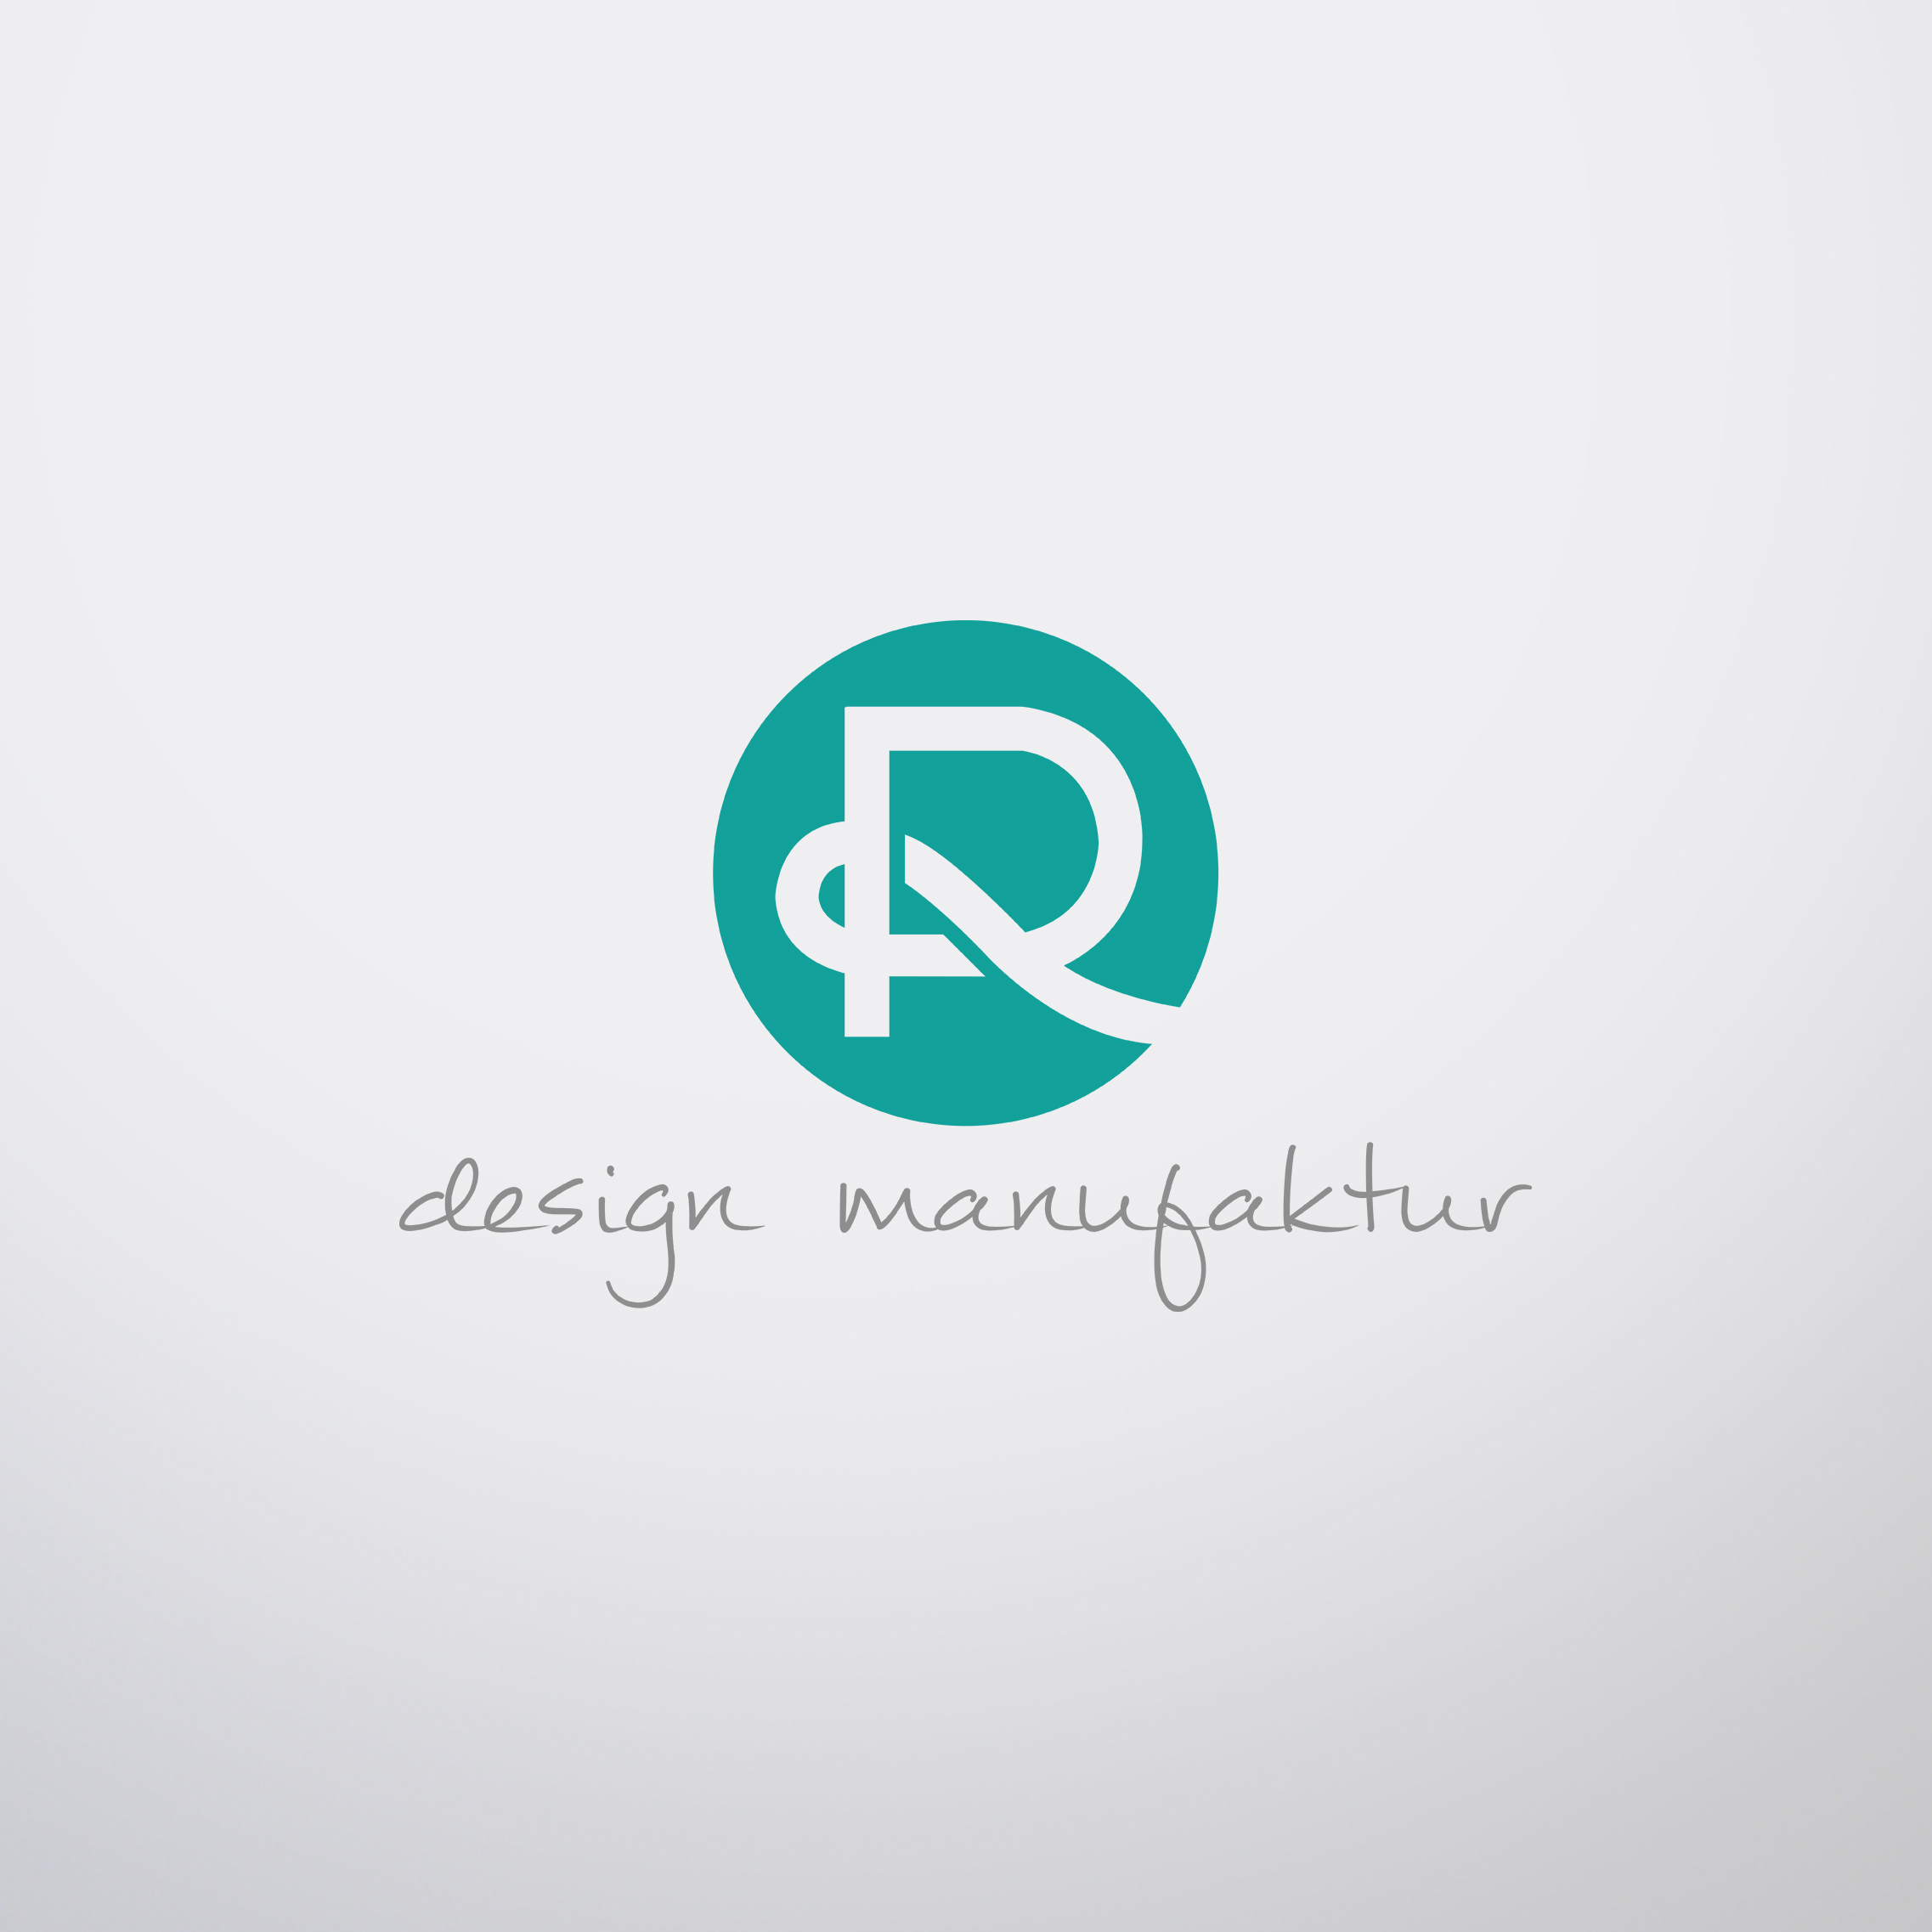 Design Manufaktur Raabe Logo